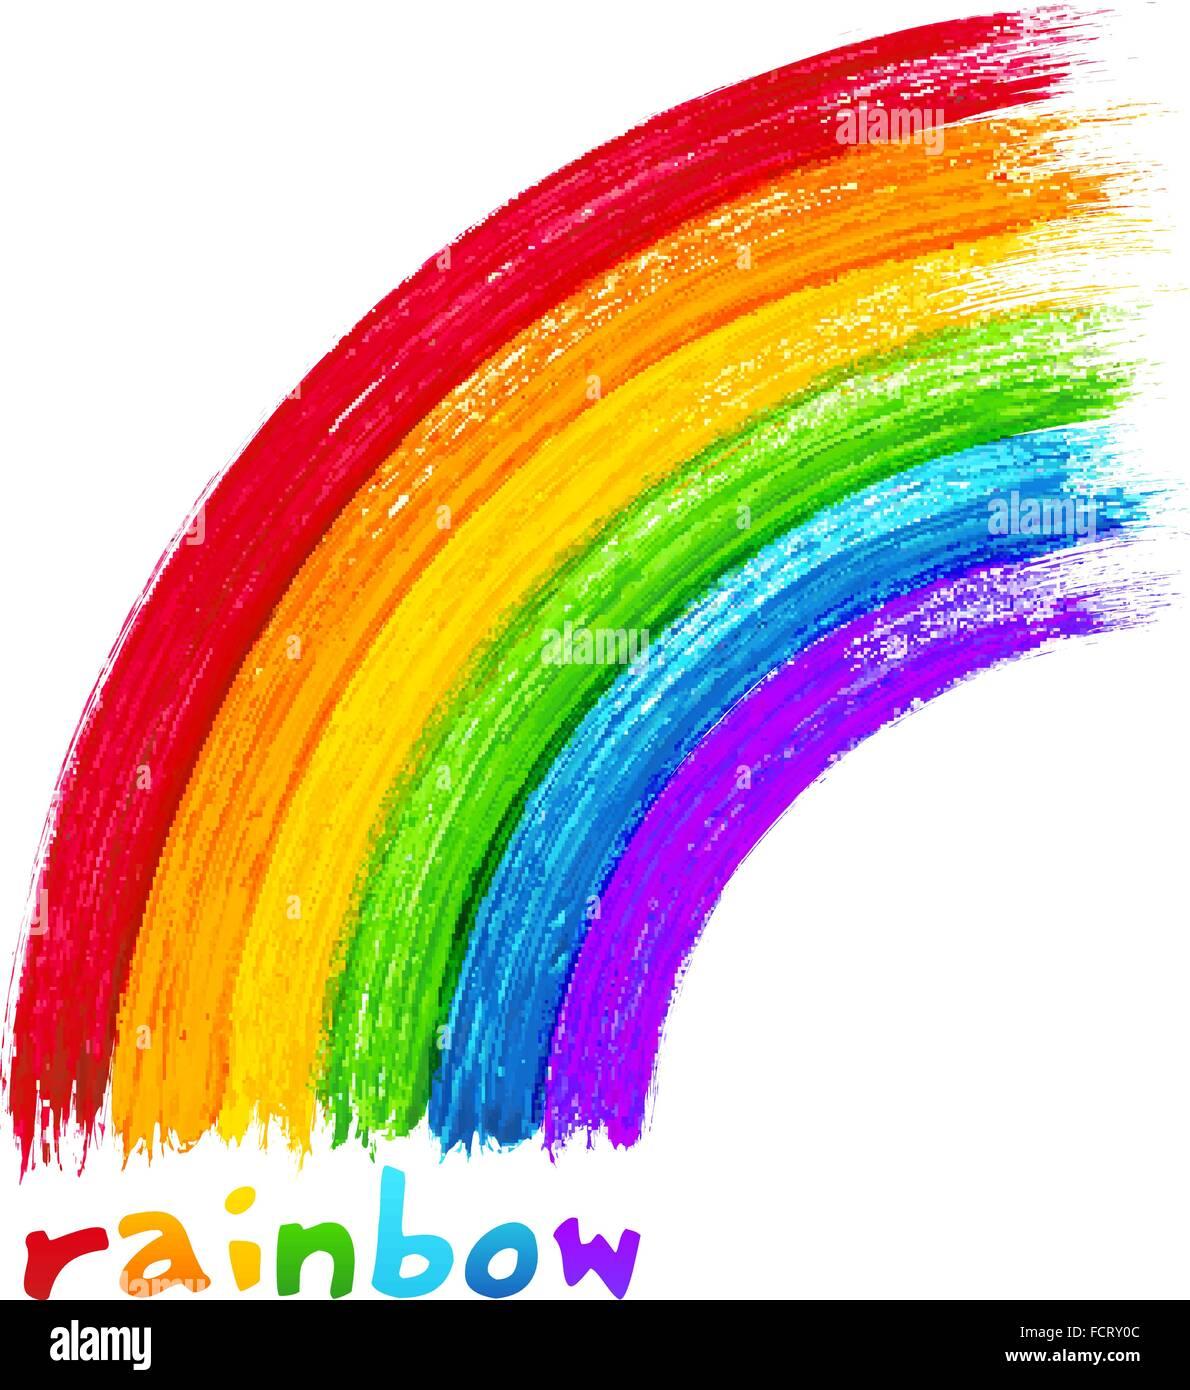 Regenbogen Bilder Gemalt